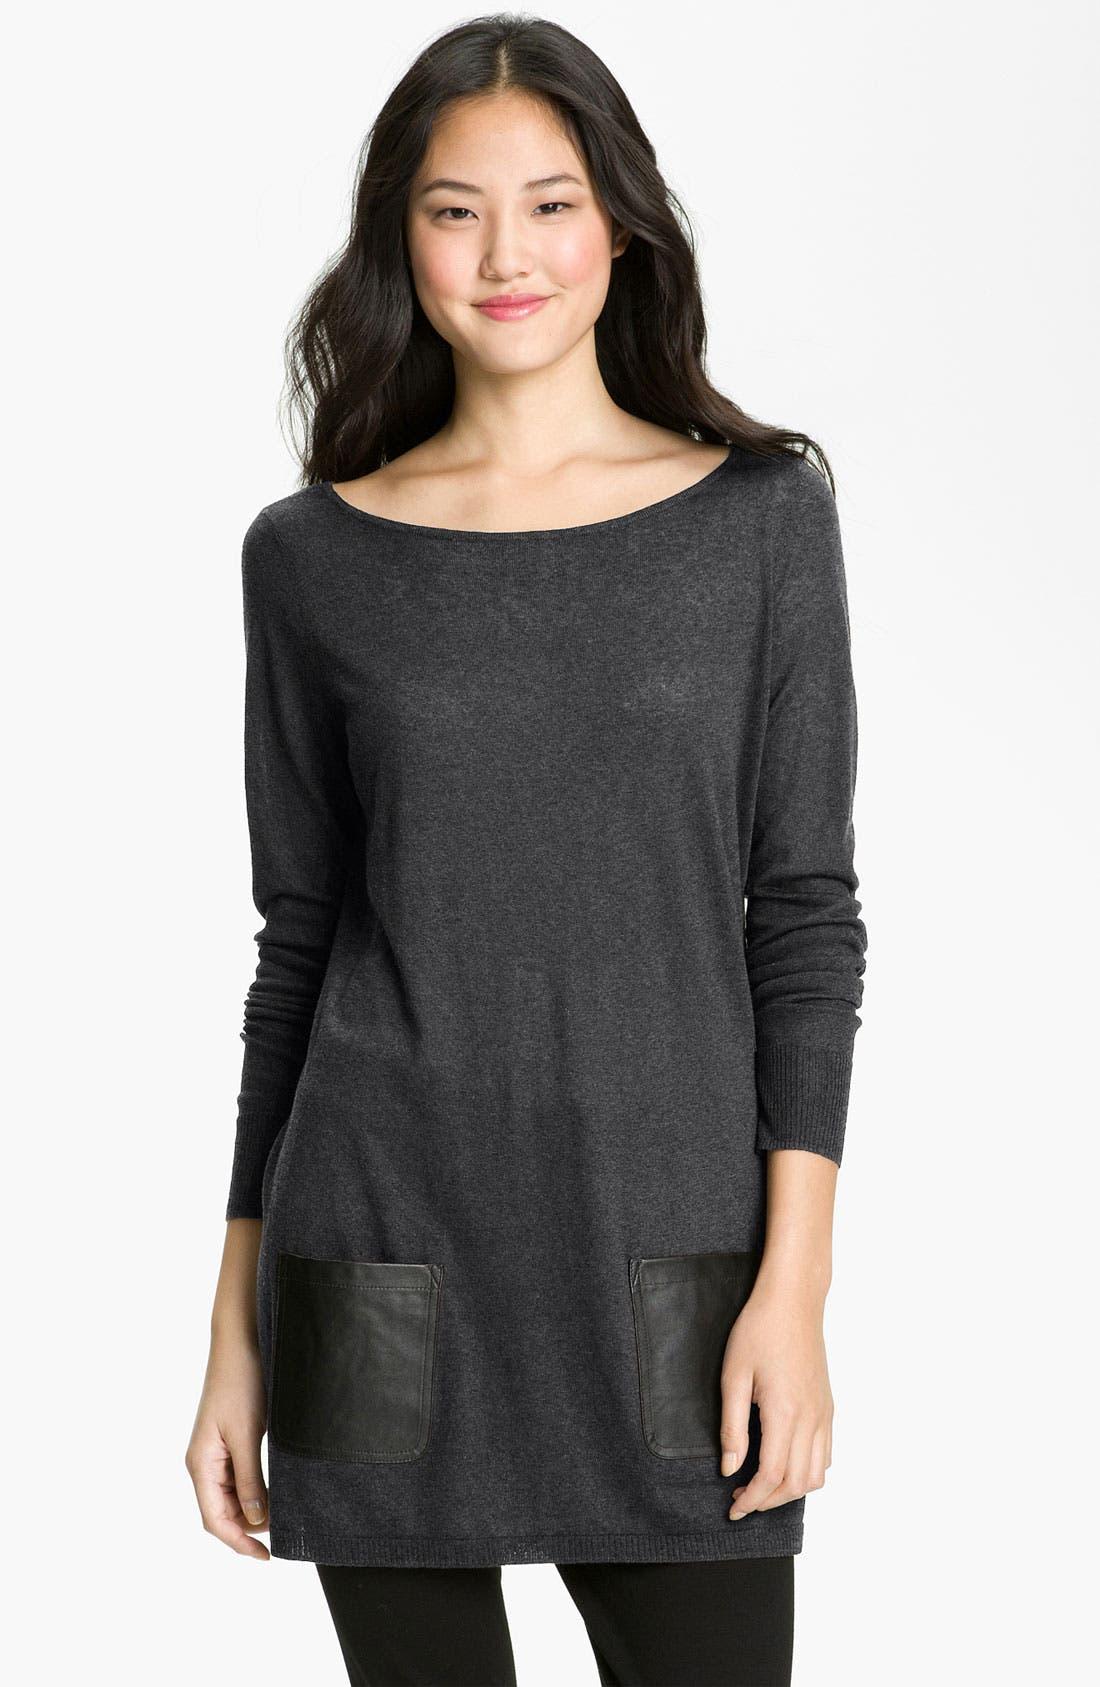 Alternate Image 1 Selected - Halogen® Sweater Tunic (Petite)